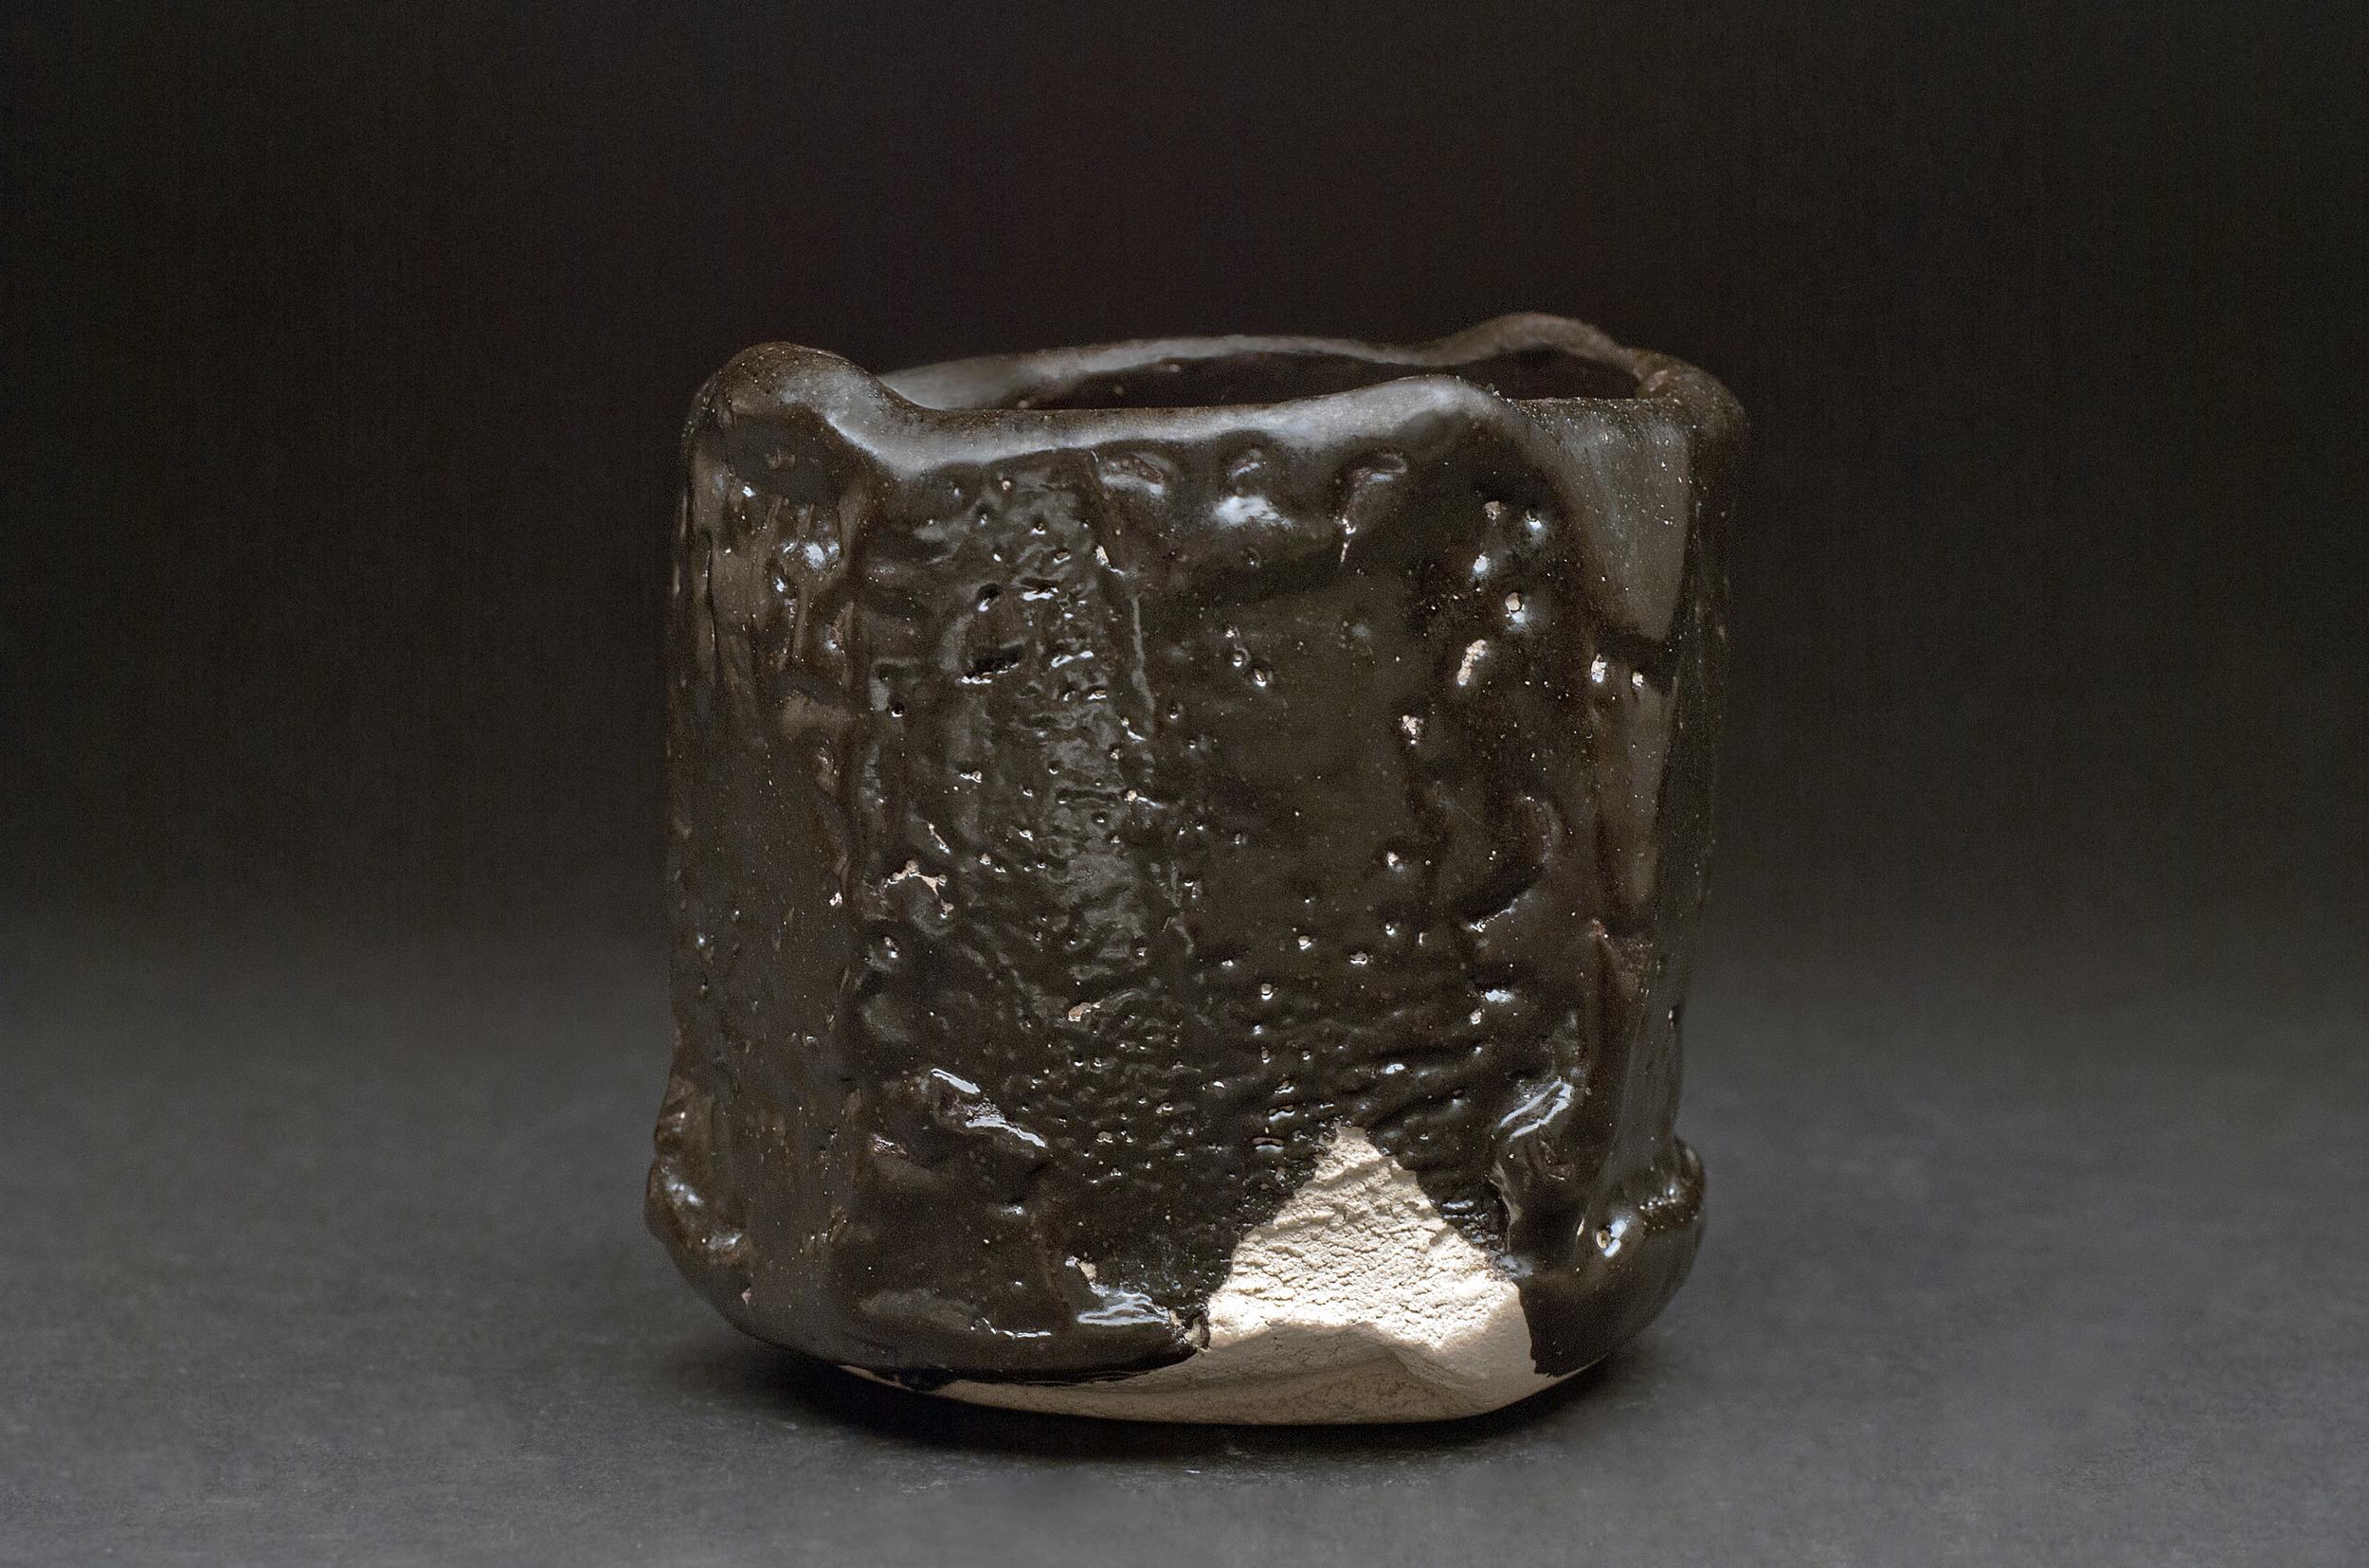 Shigemasa Higashida    Seto Guro Tea Bowl  , 2011 Earthenware 4.5 x 4.5 inches / 11.4 x 11.4 cm / SHig 3